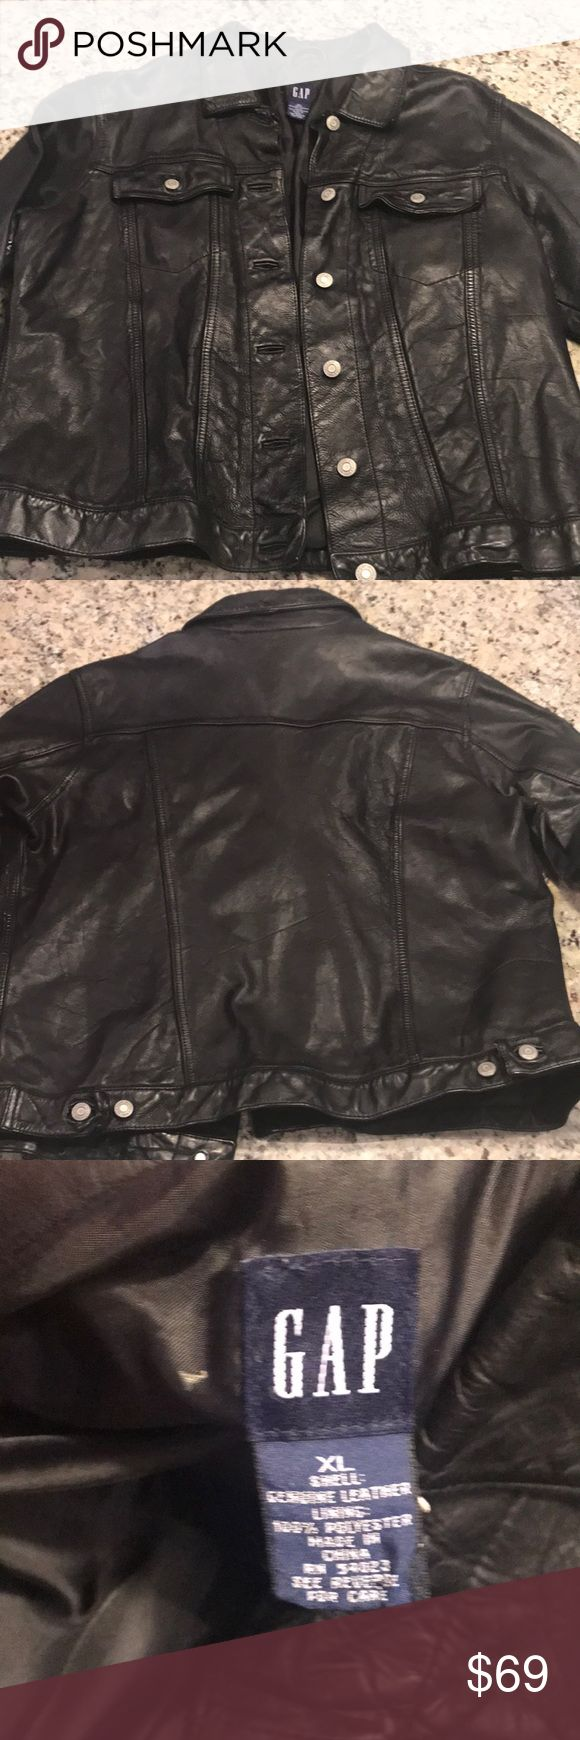 Authentic Vintage Black Leather Gap Jacket Authentic Vintage Black Leather Gap Jacket. Like New Condition. GAP Jackets & Coats